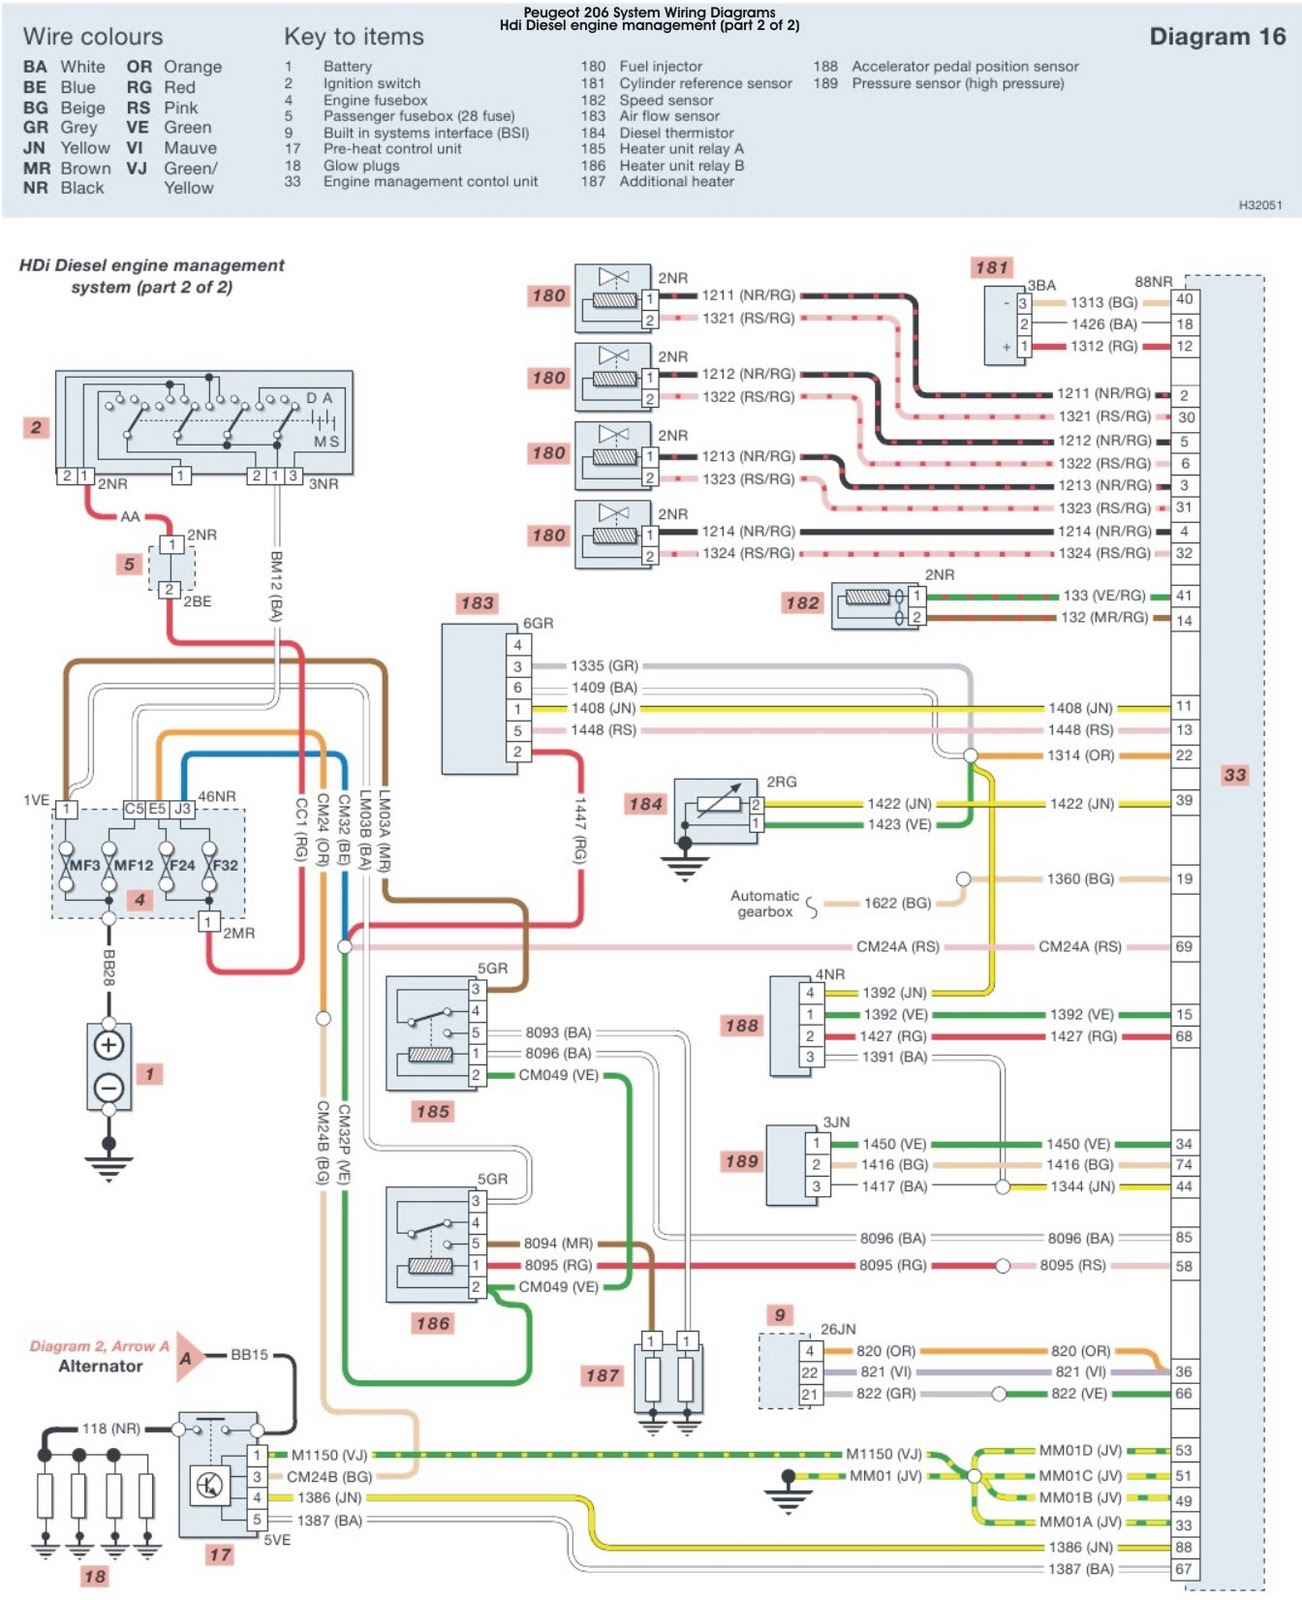 Peugeot 206 HDi Diesel Engine Management System part 2 Wiring Diagrams | Schematic Wiring